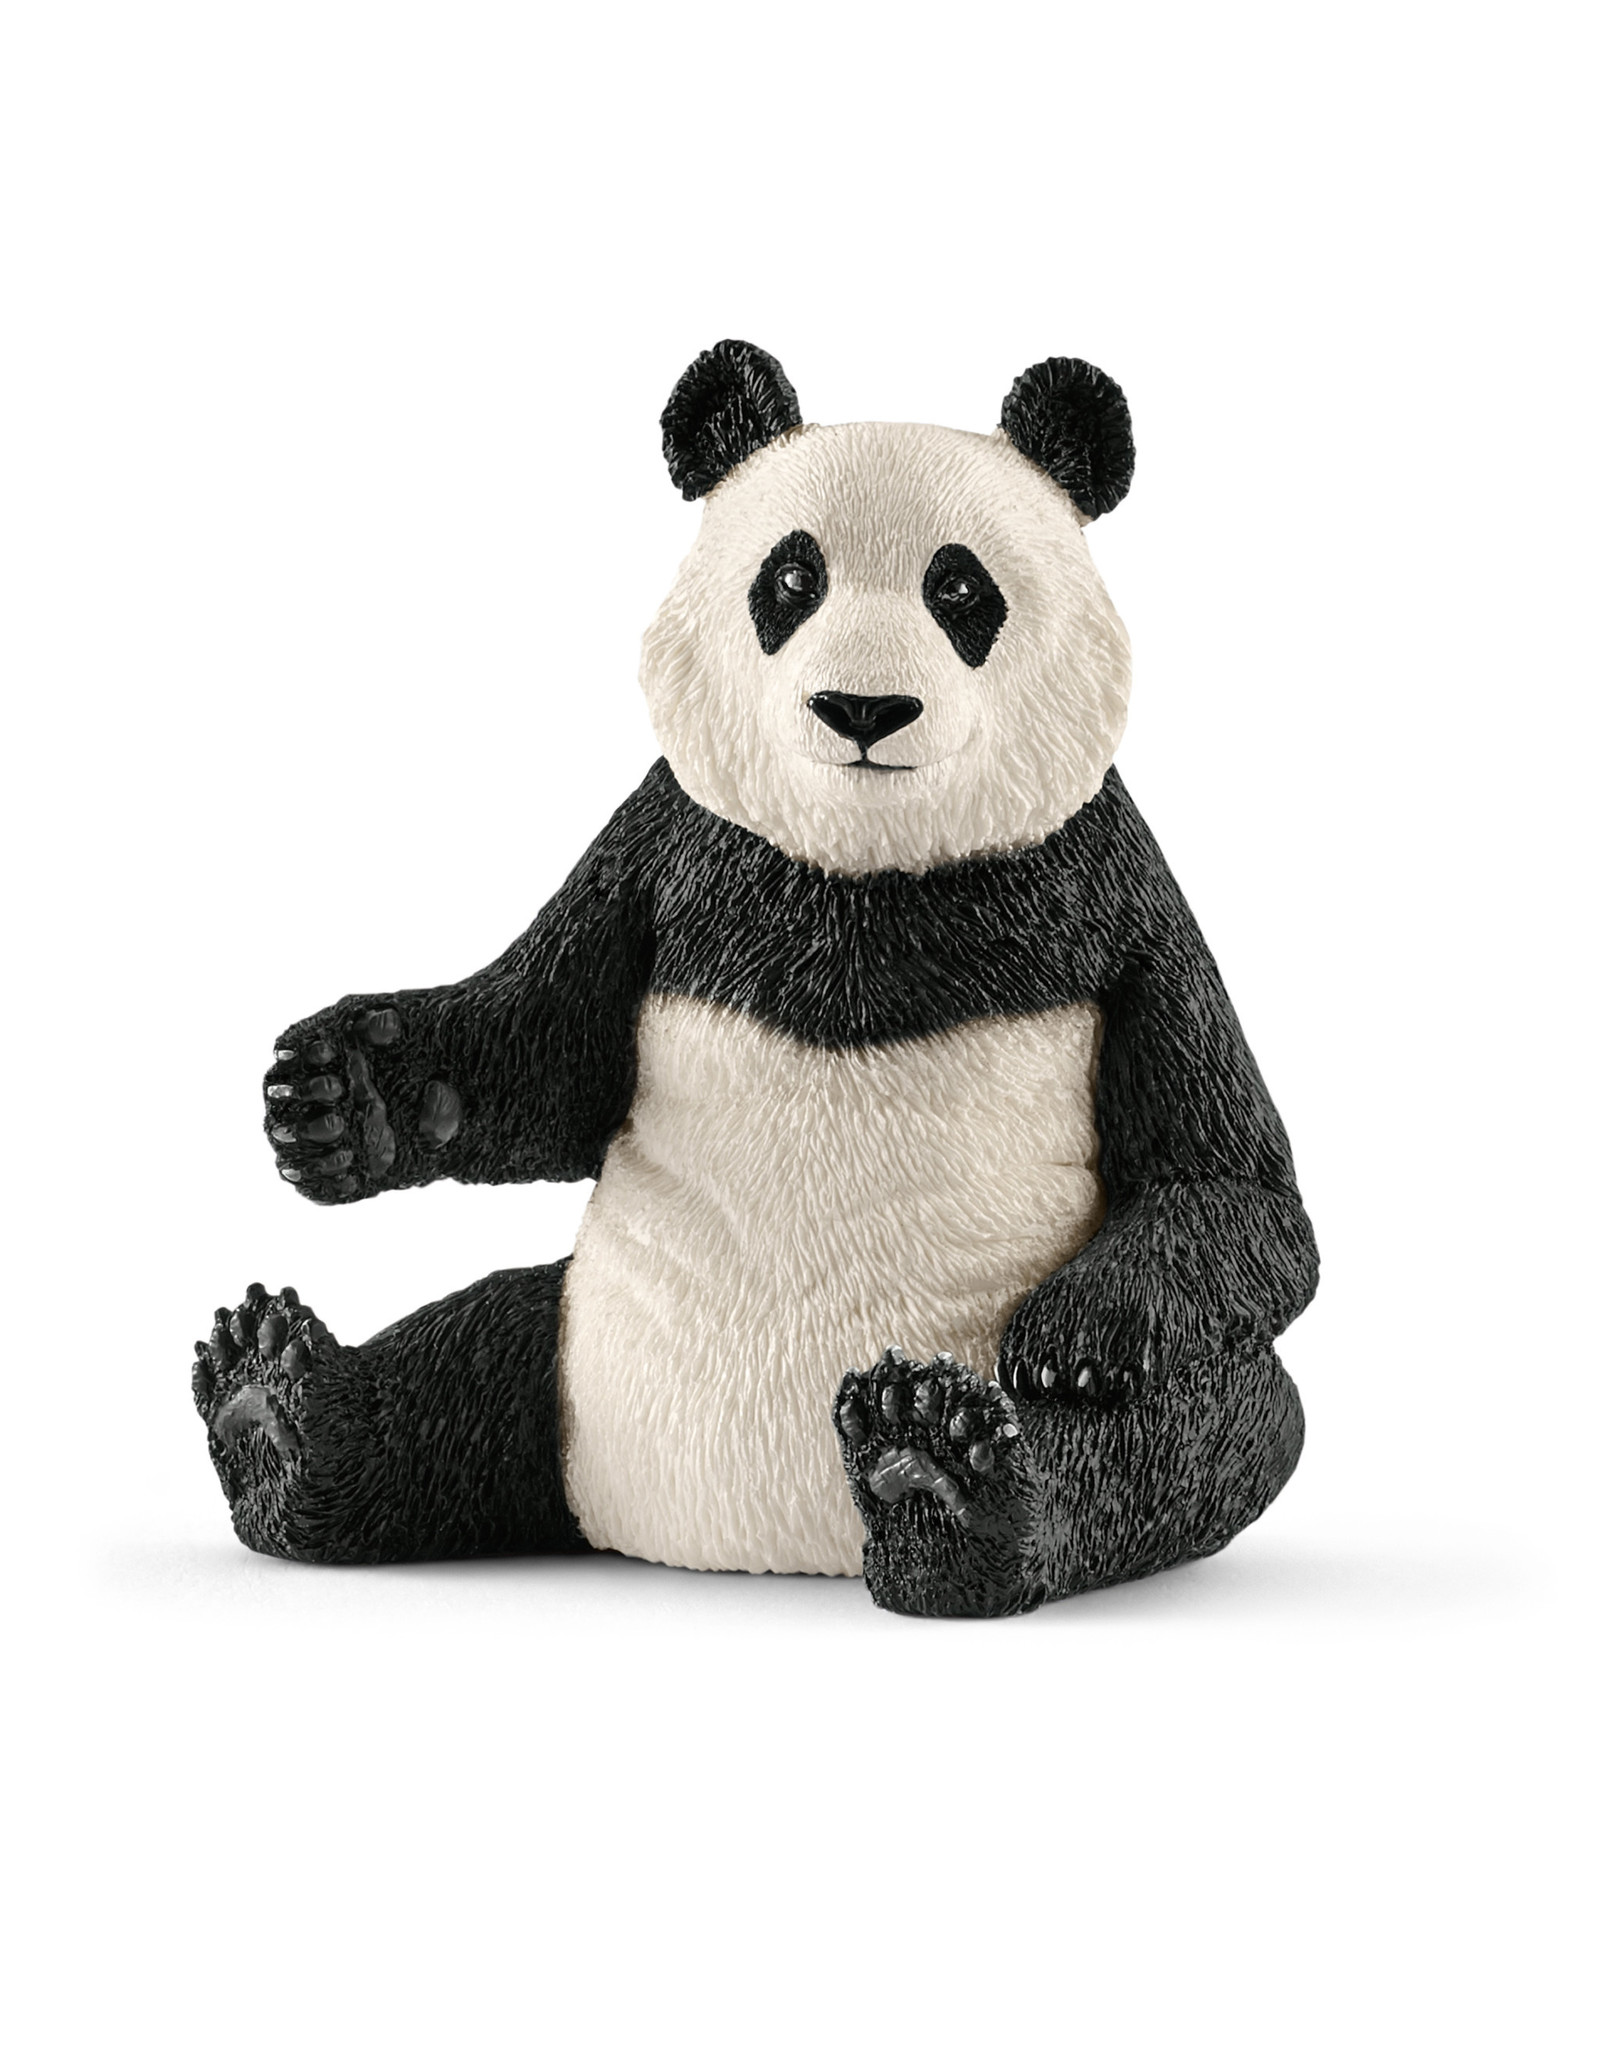 Schleich Giant panda, female